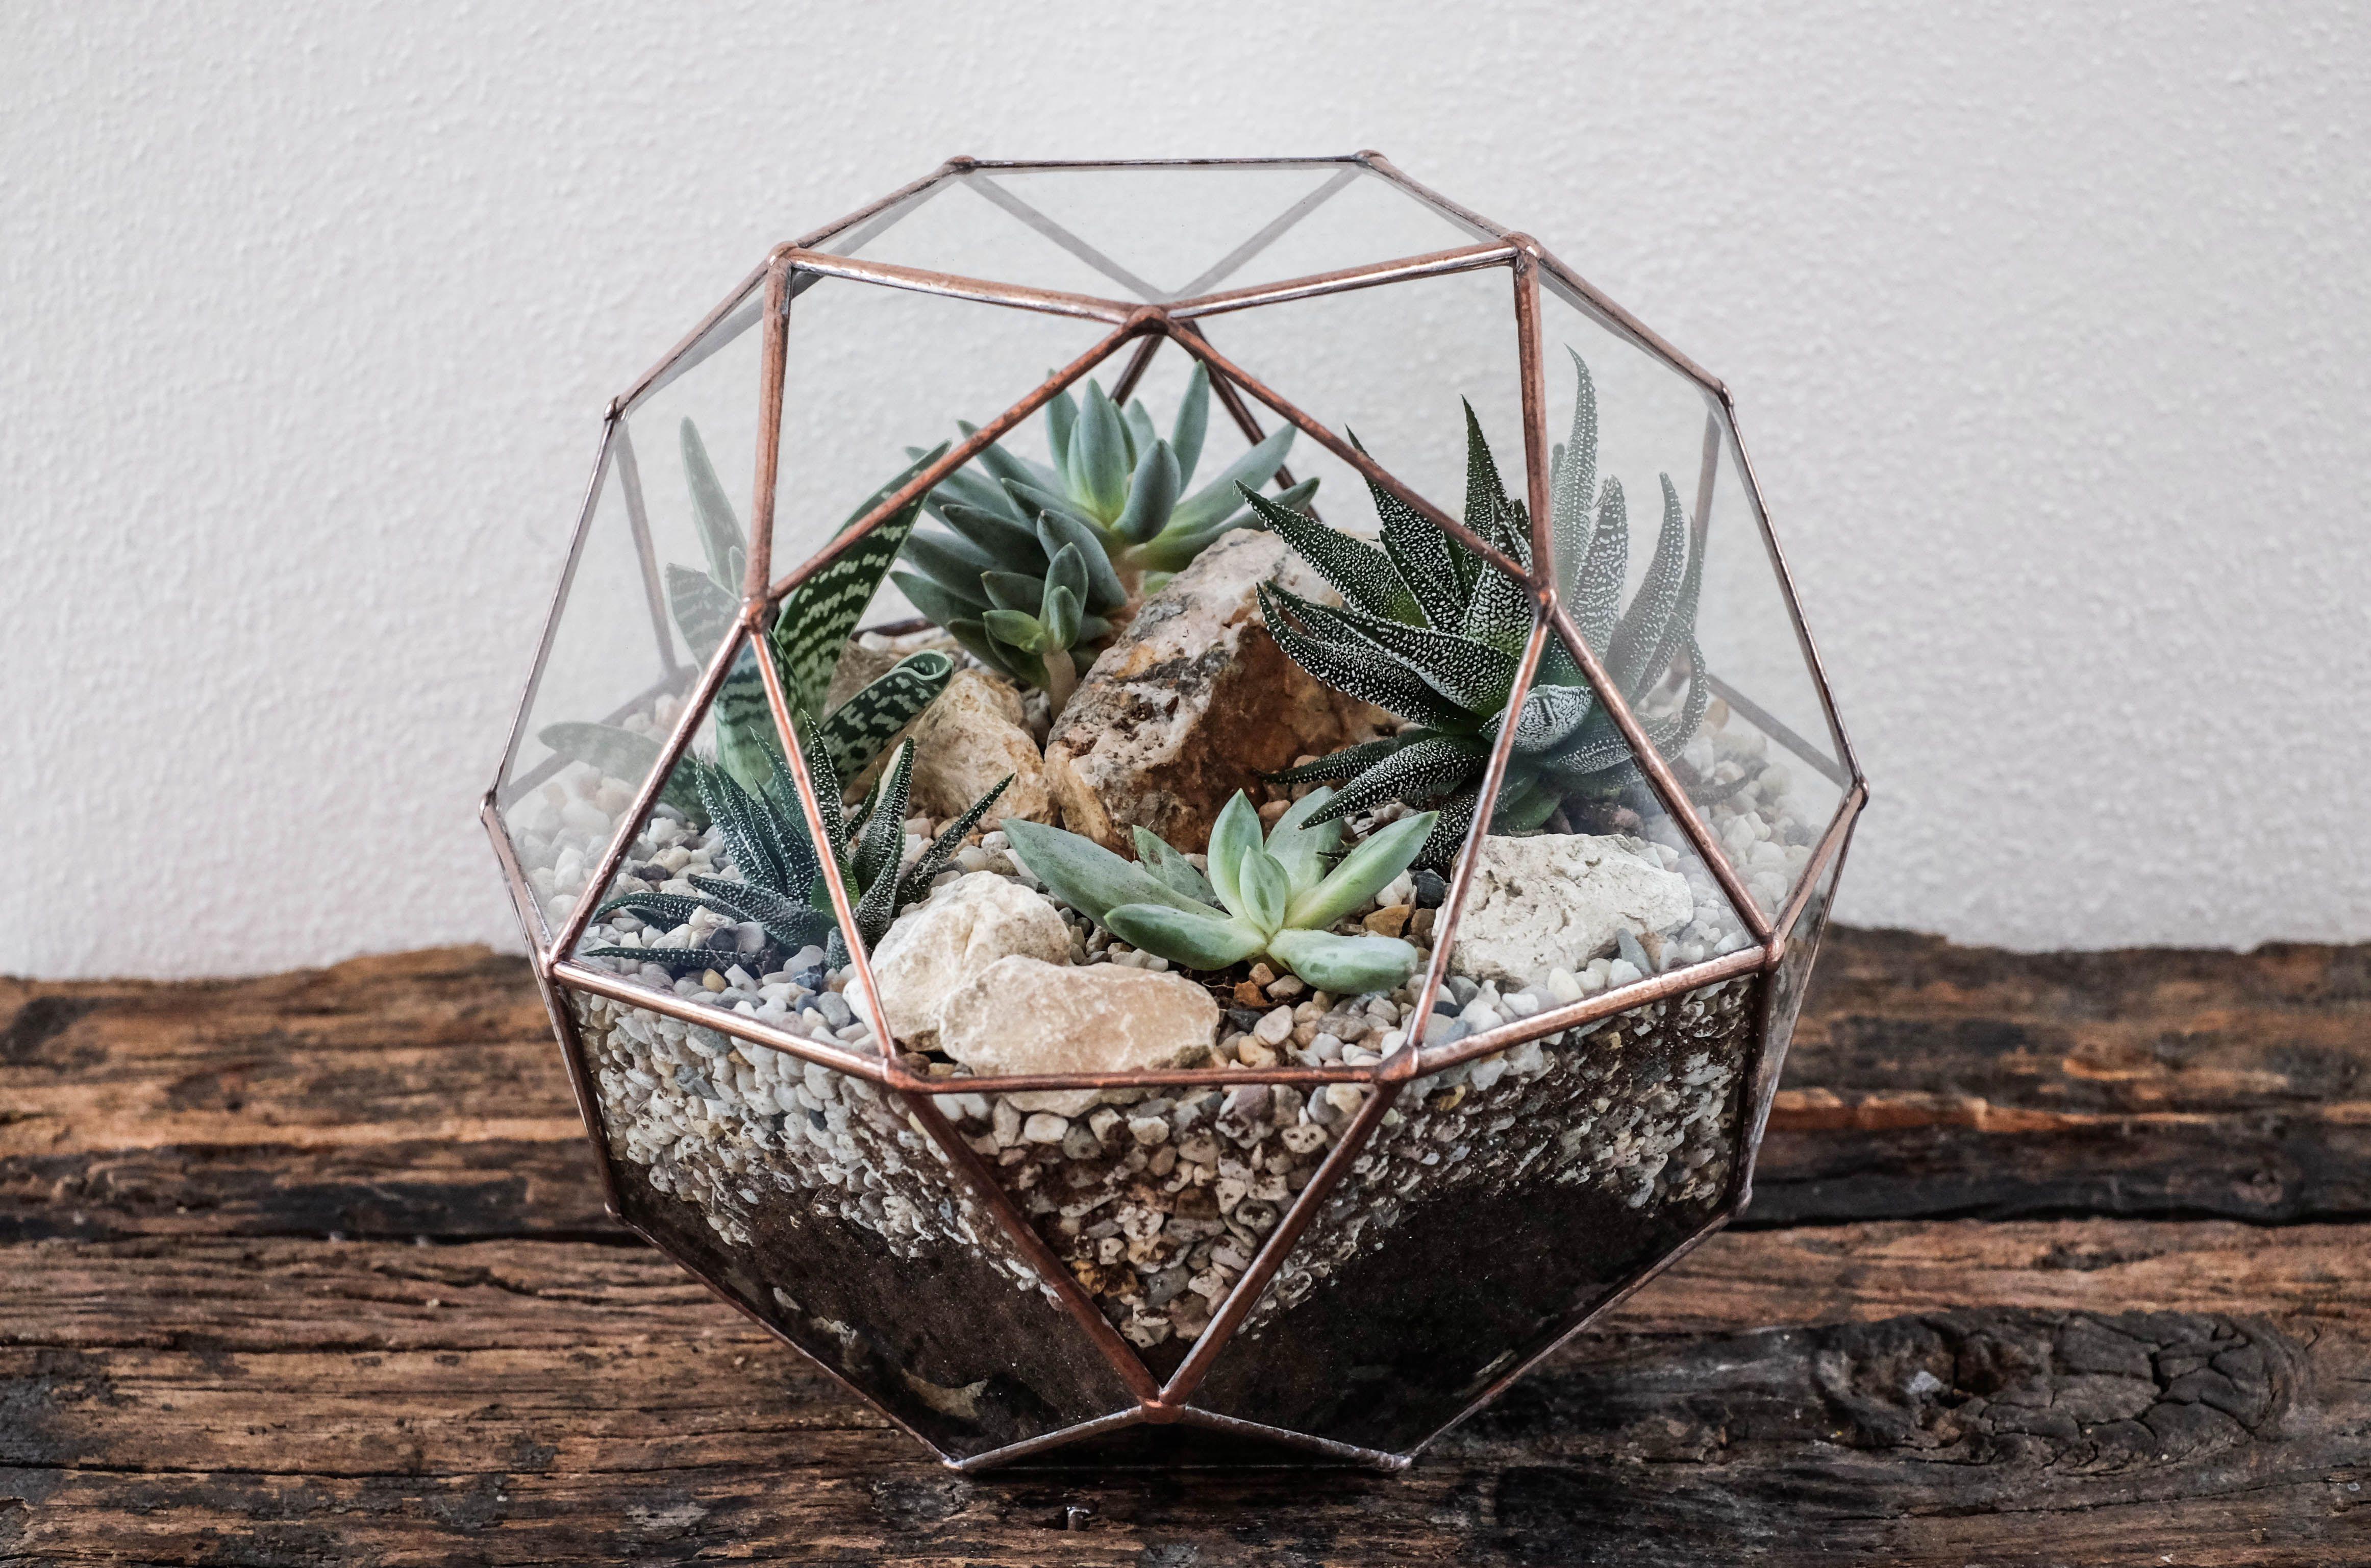 #Schoenedeko Mein Diy Terrarium Indoor Gardening Mit Anleitung